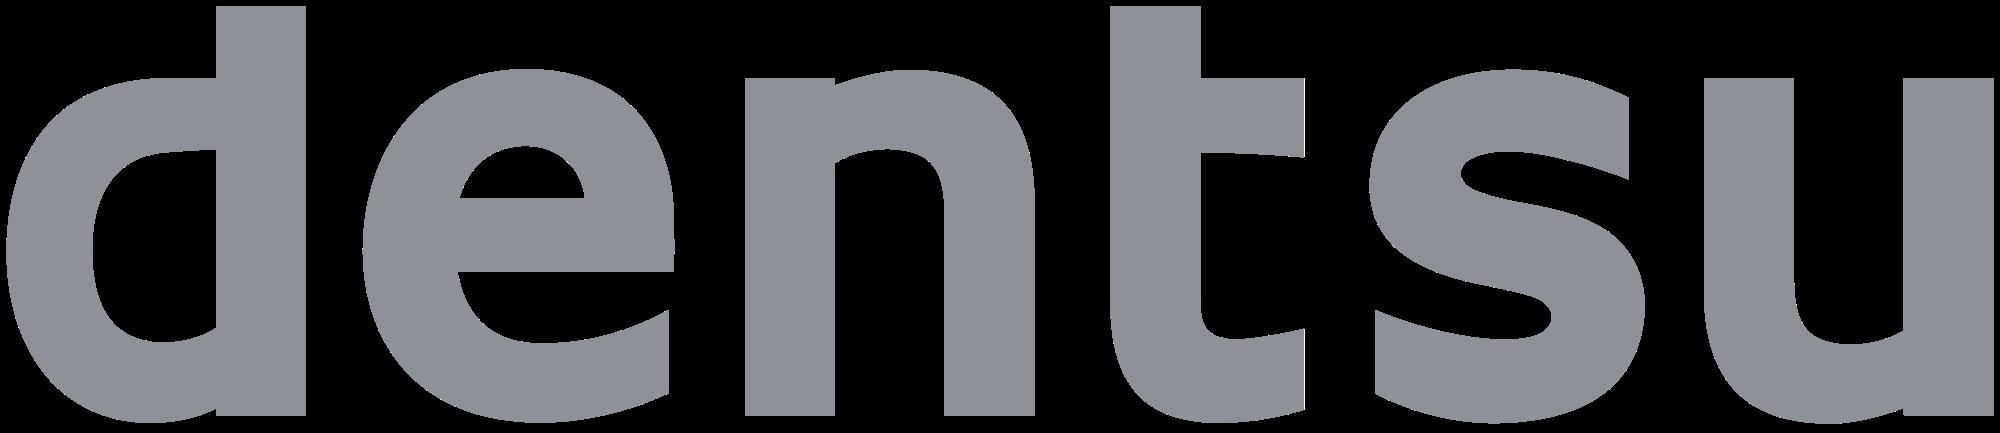 Dentsu_logo.svg